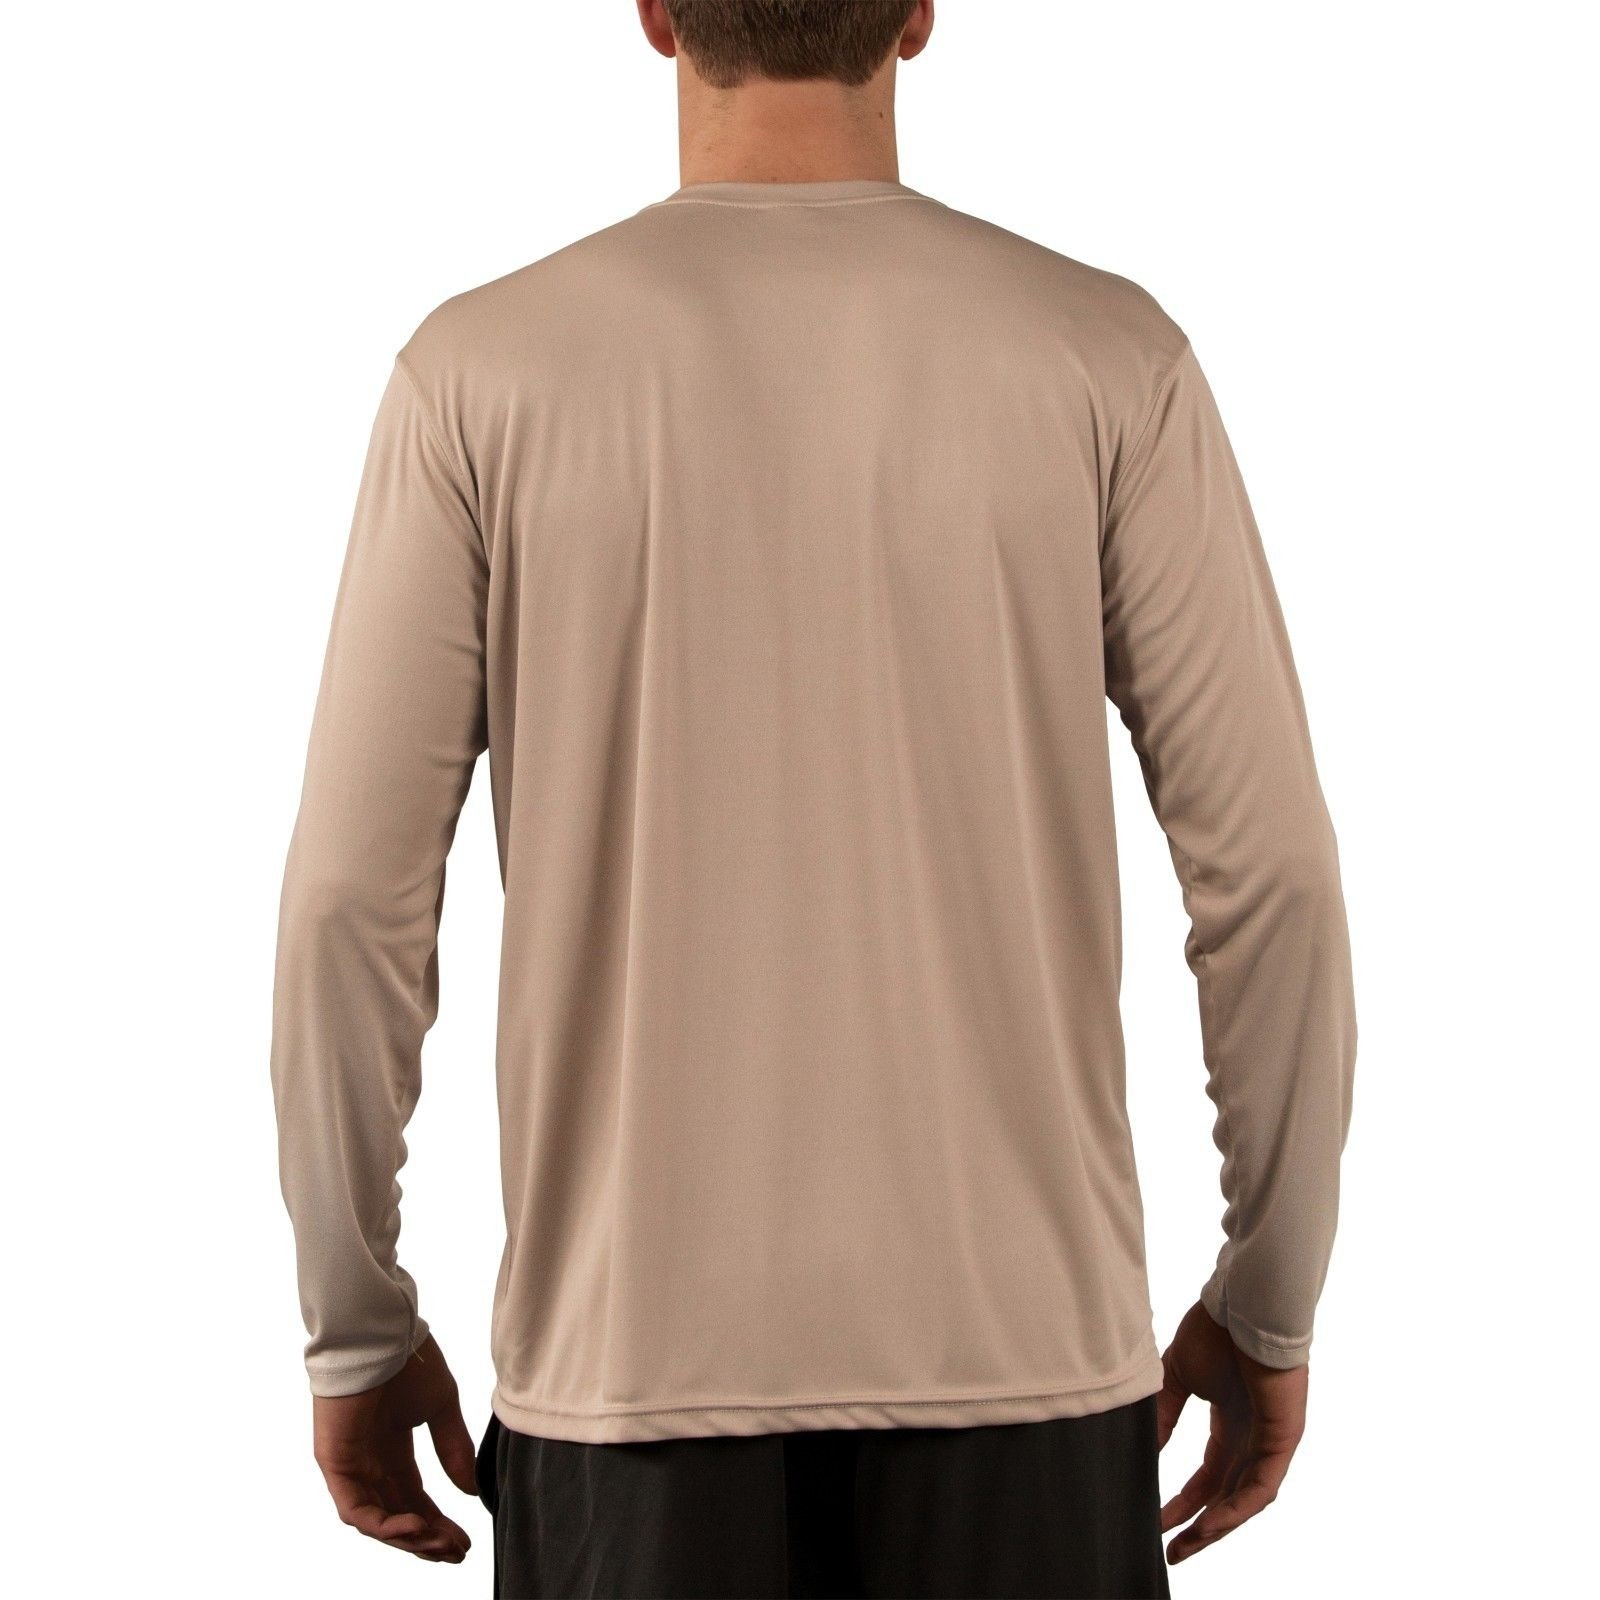 Vapor-Apparel-Men-039-s-UPF-50-UV-Sun-Protection-Long-Sleeve-Performance-T-Shirt